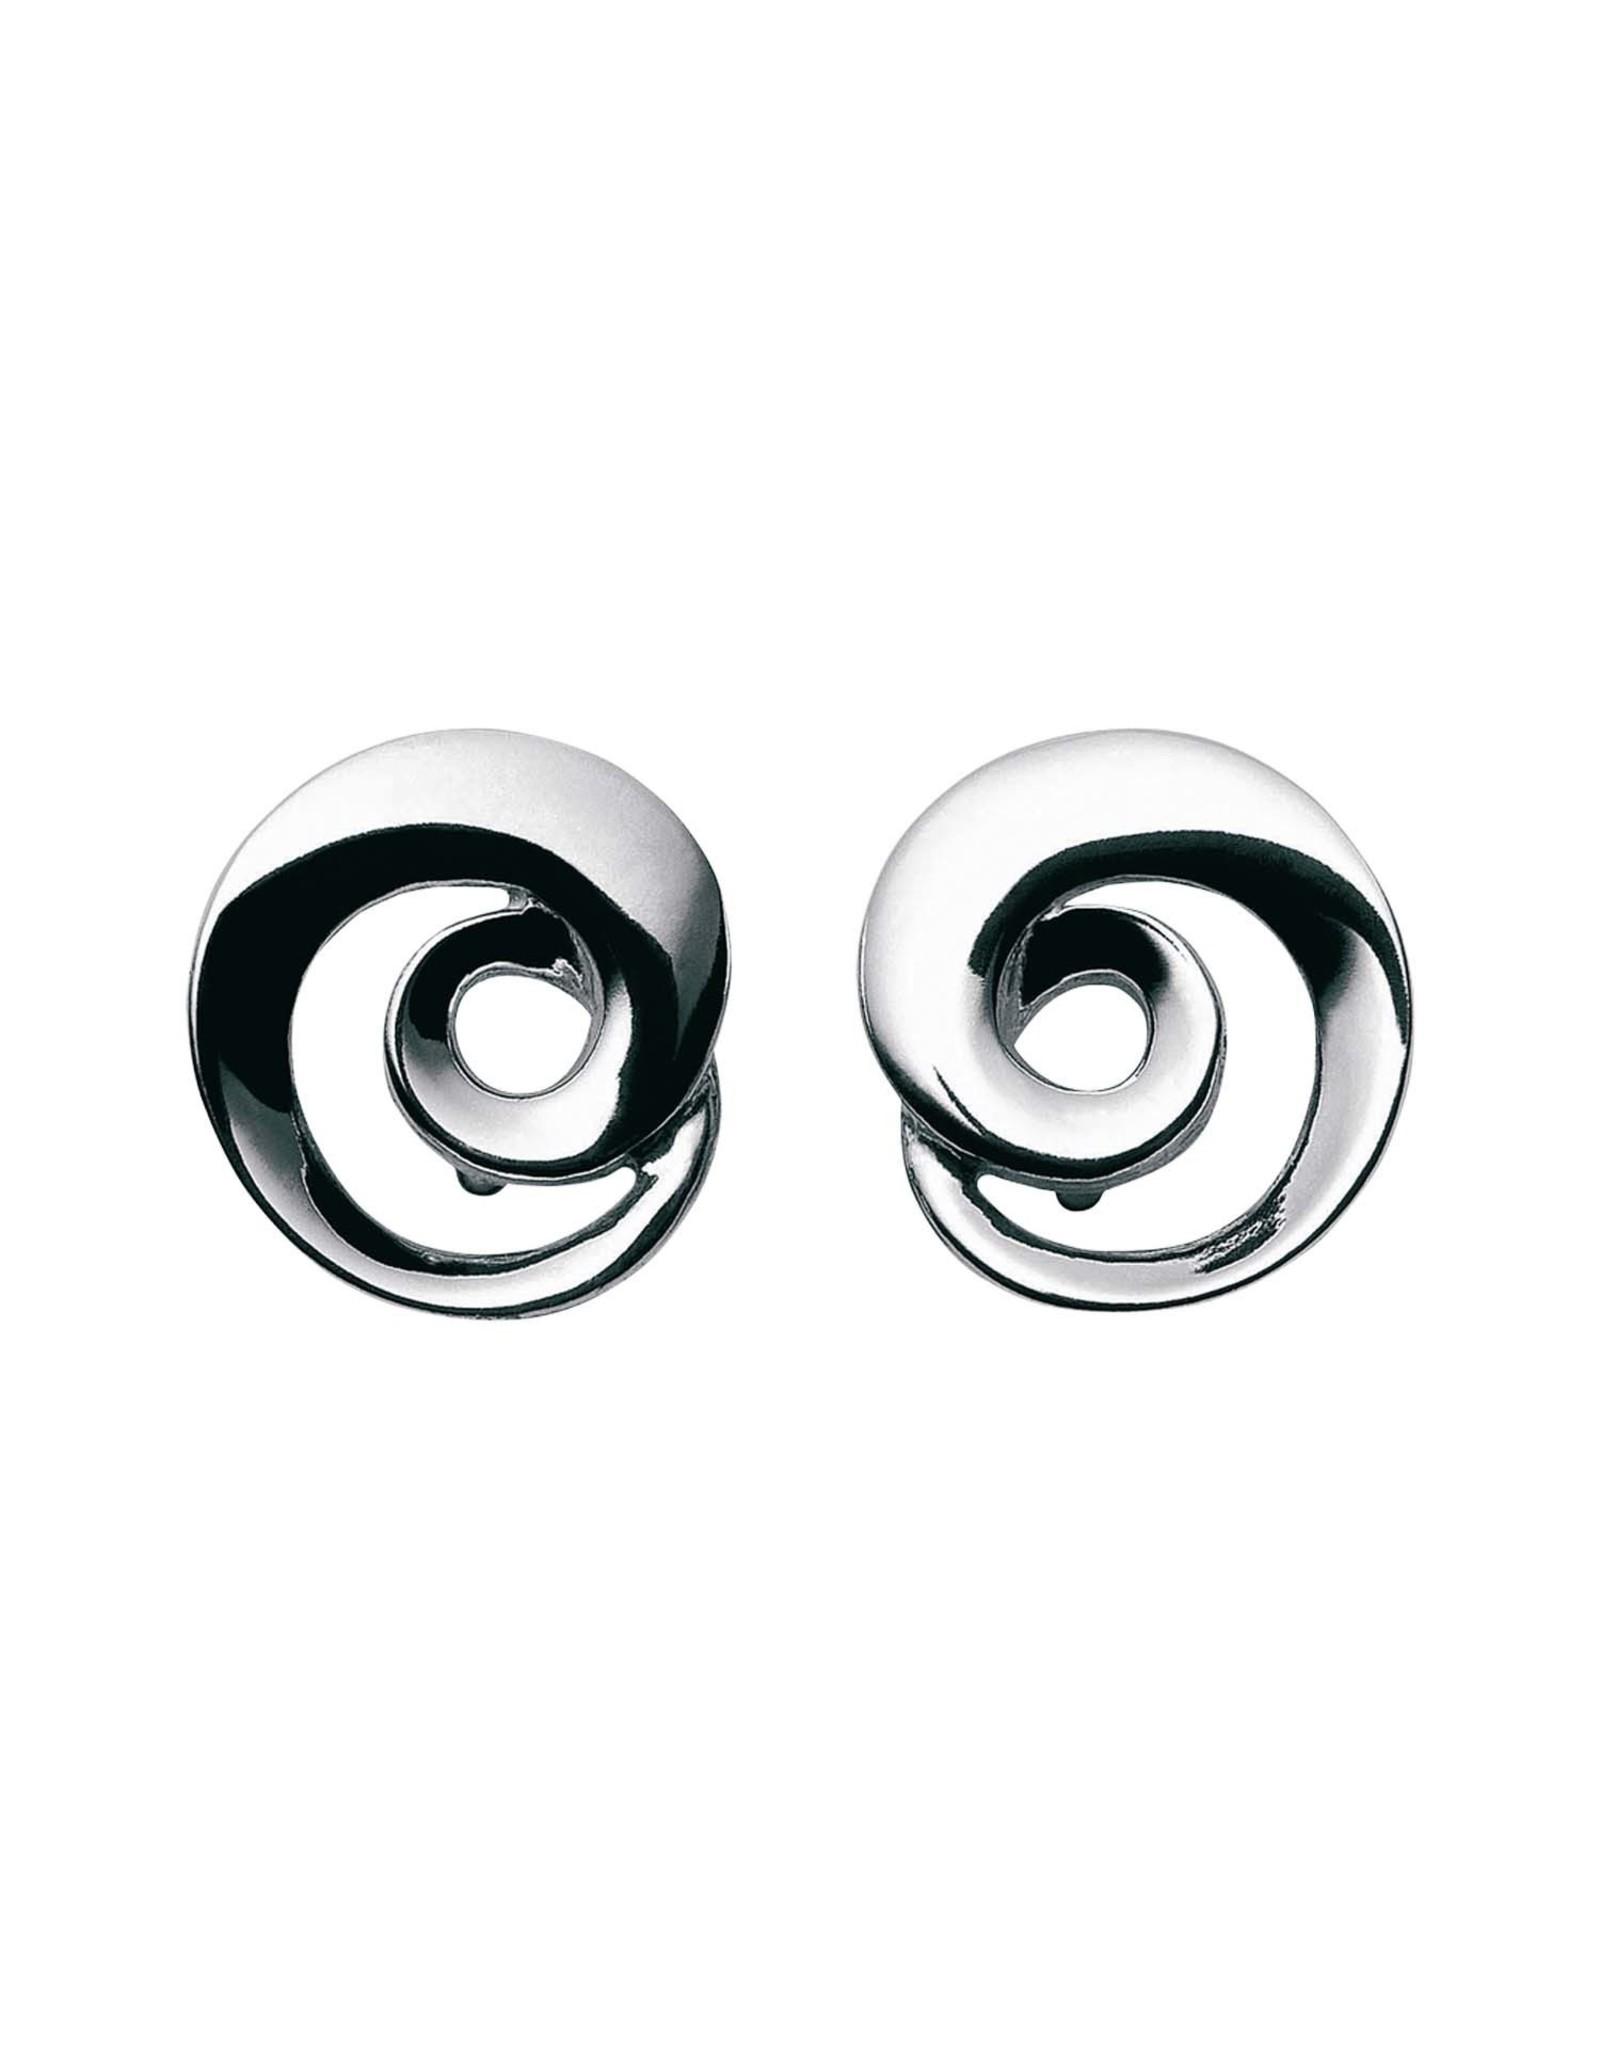 Georg Jensen Mobius Earrings, Silver